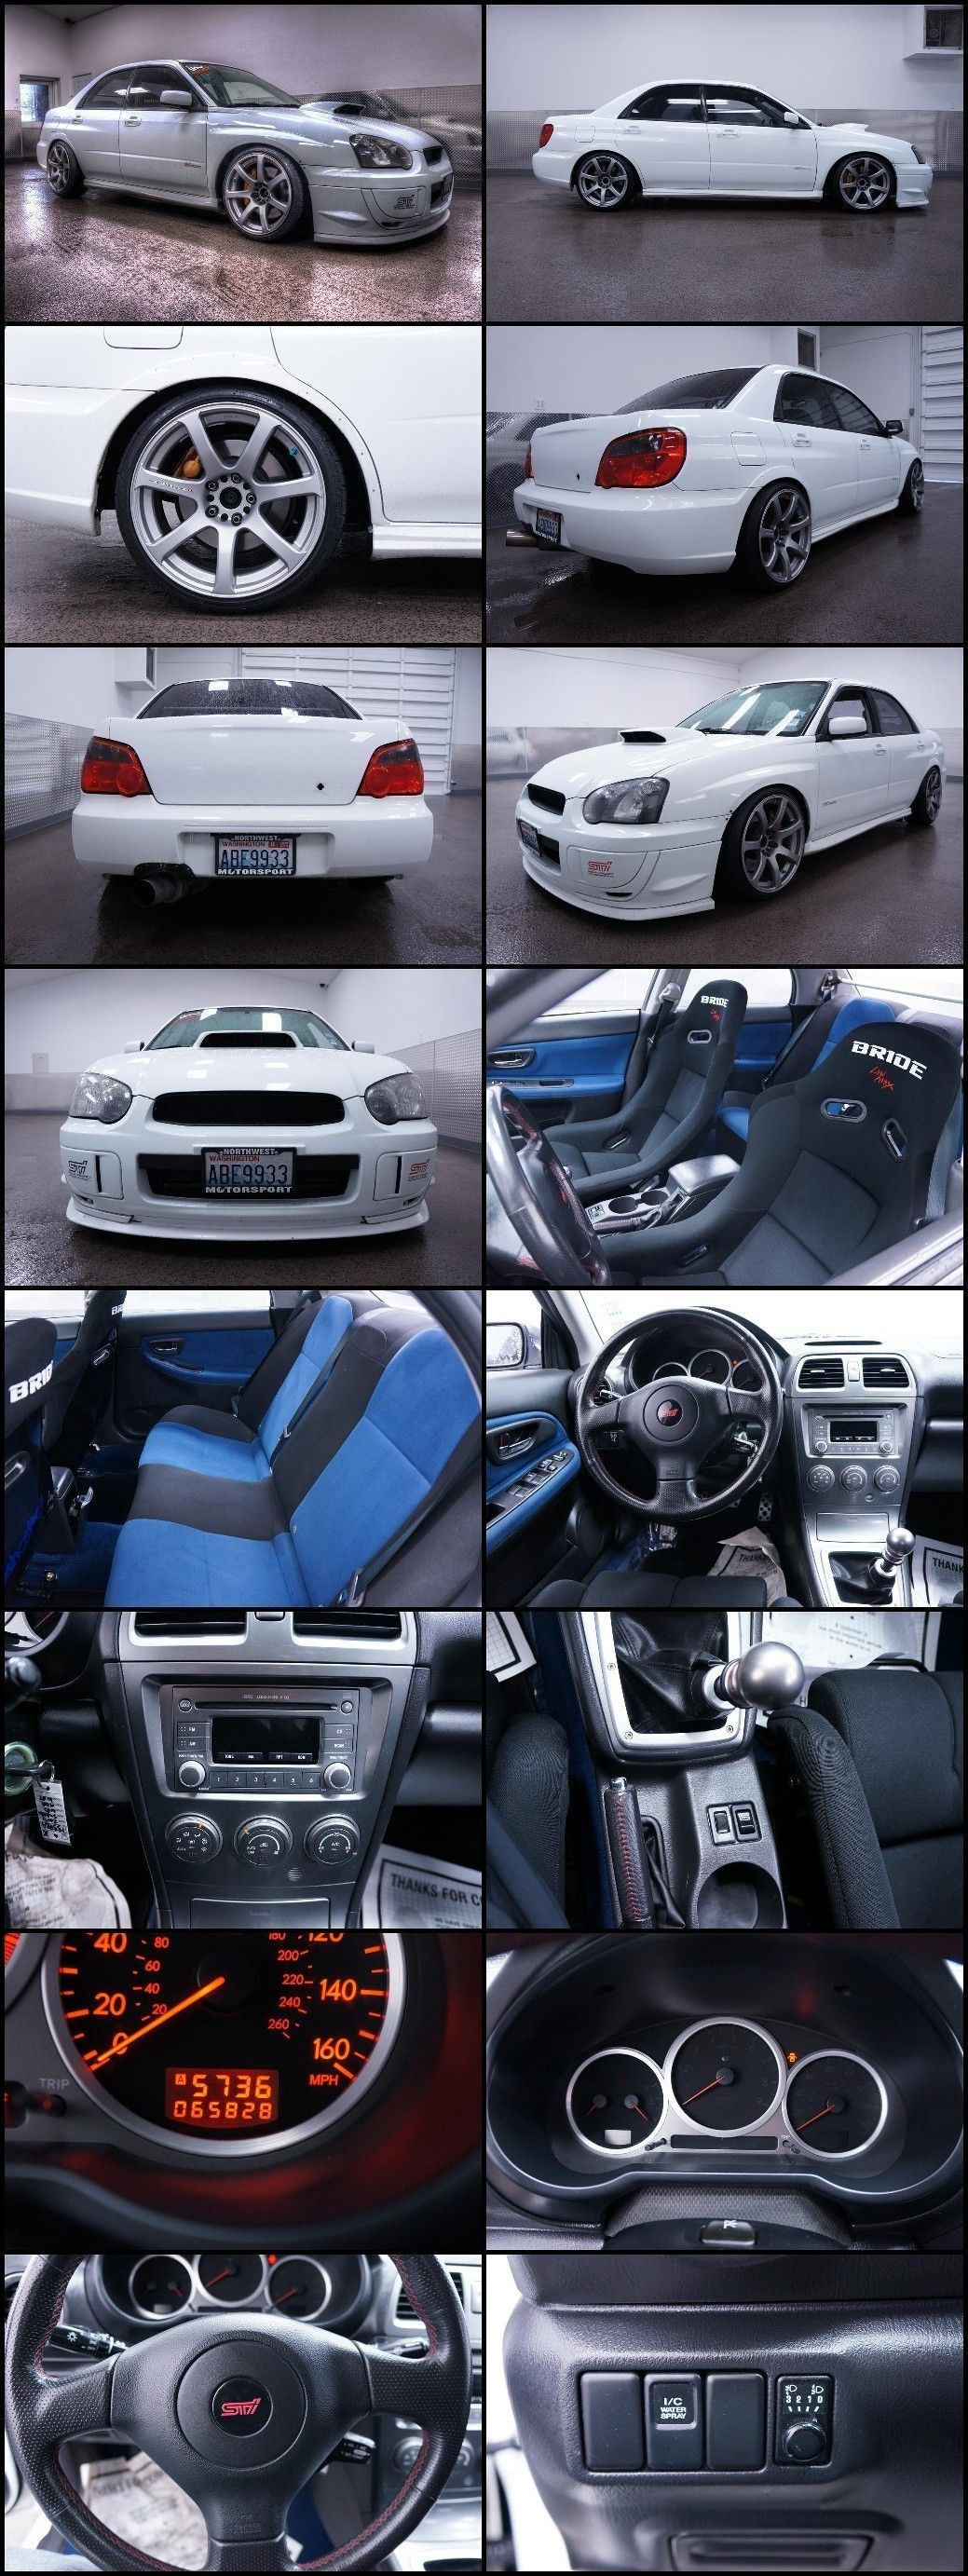 Subaru Impreza Wrx Sti Awd Turbo All Wheel Drive Sedan Fast